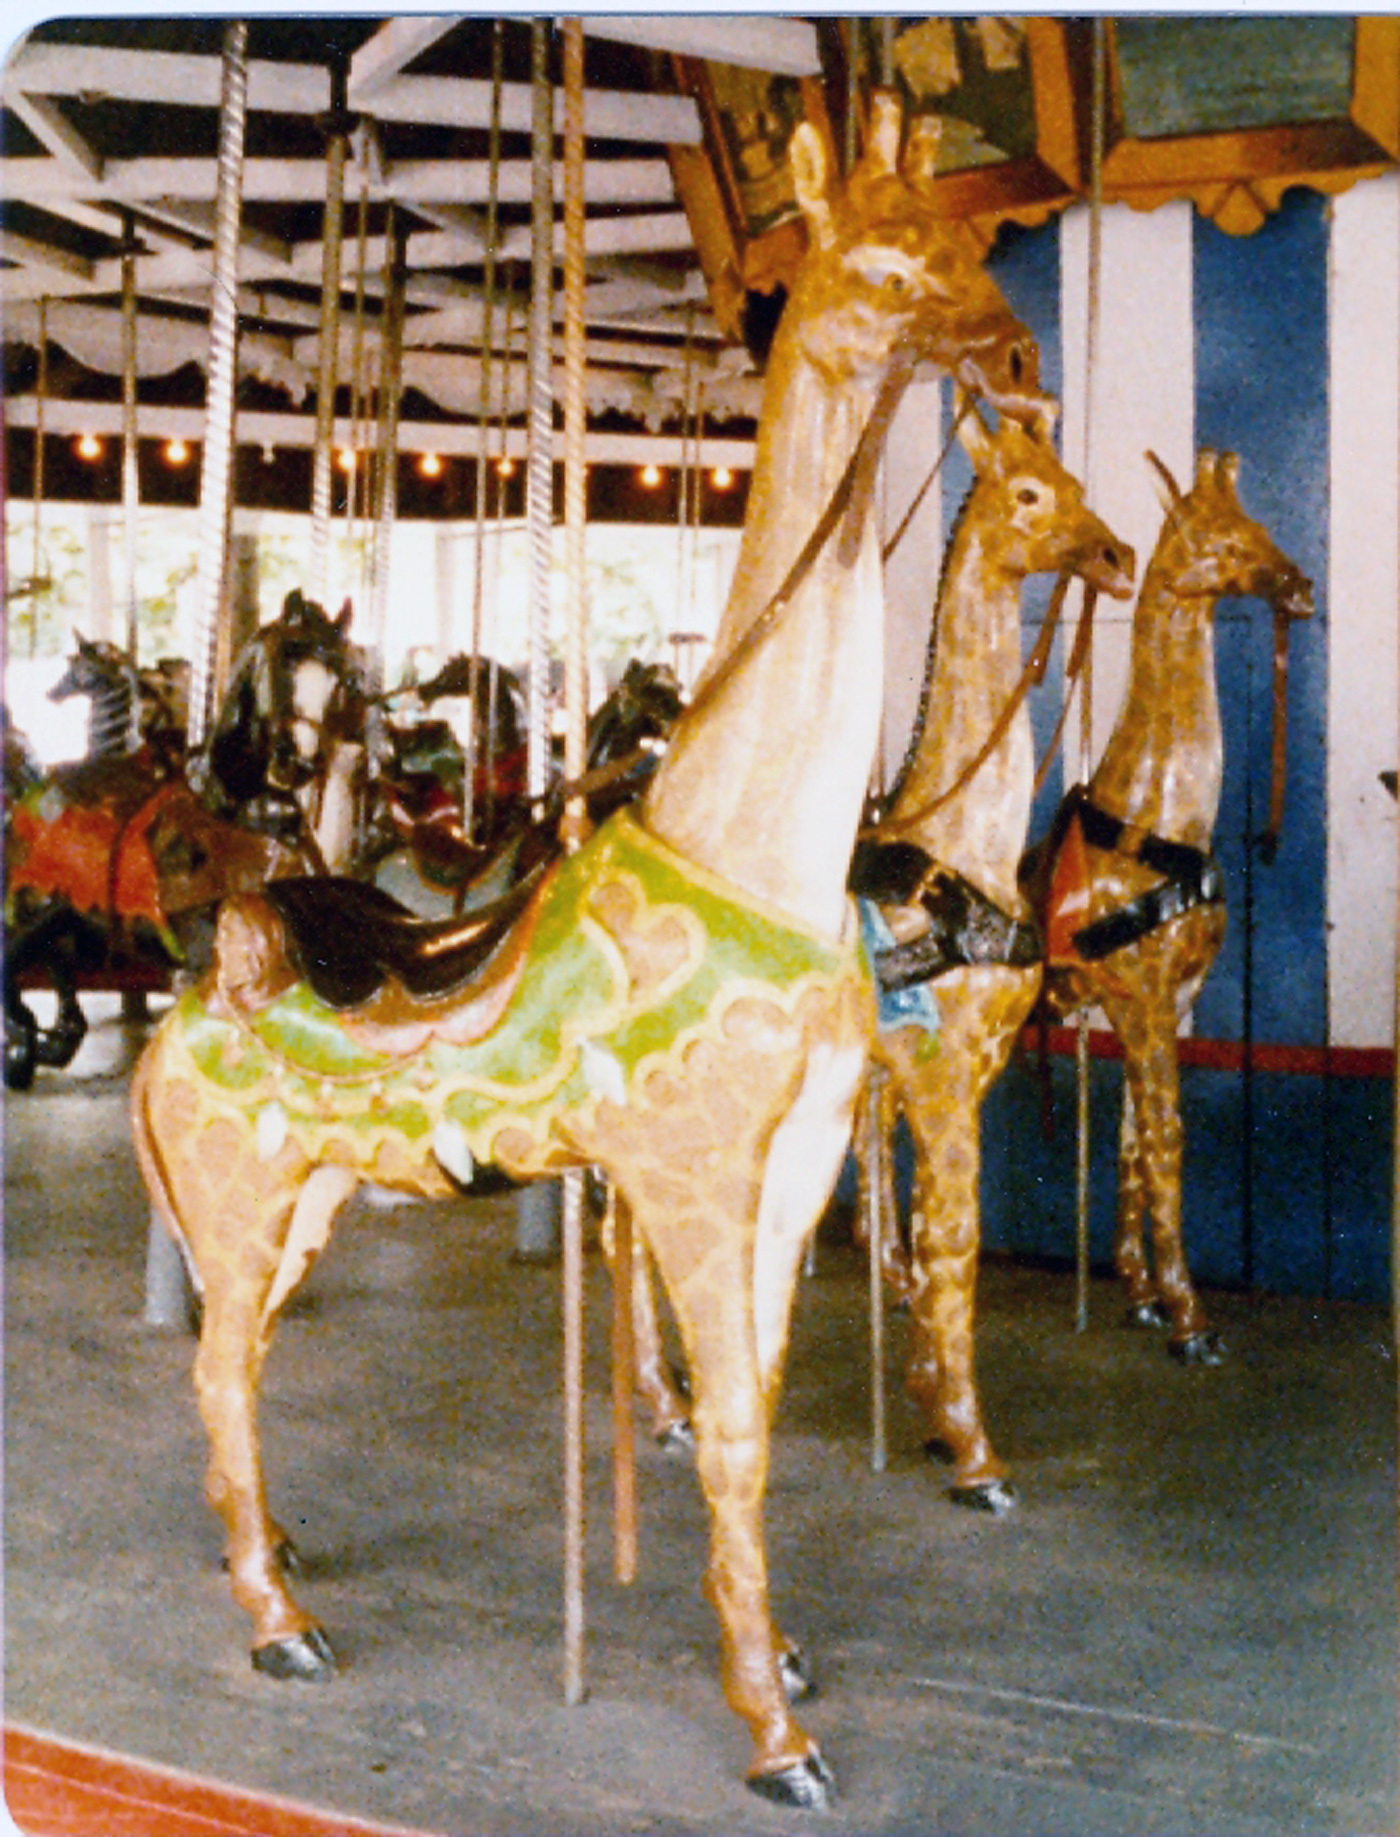 Lake-Quassy-Historic-1902-E-Joy-Morris-carousel-giraffe-2